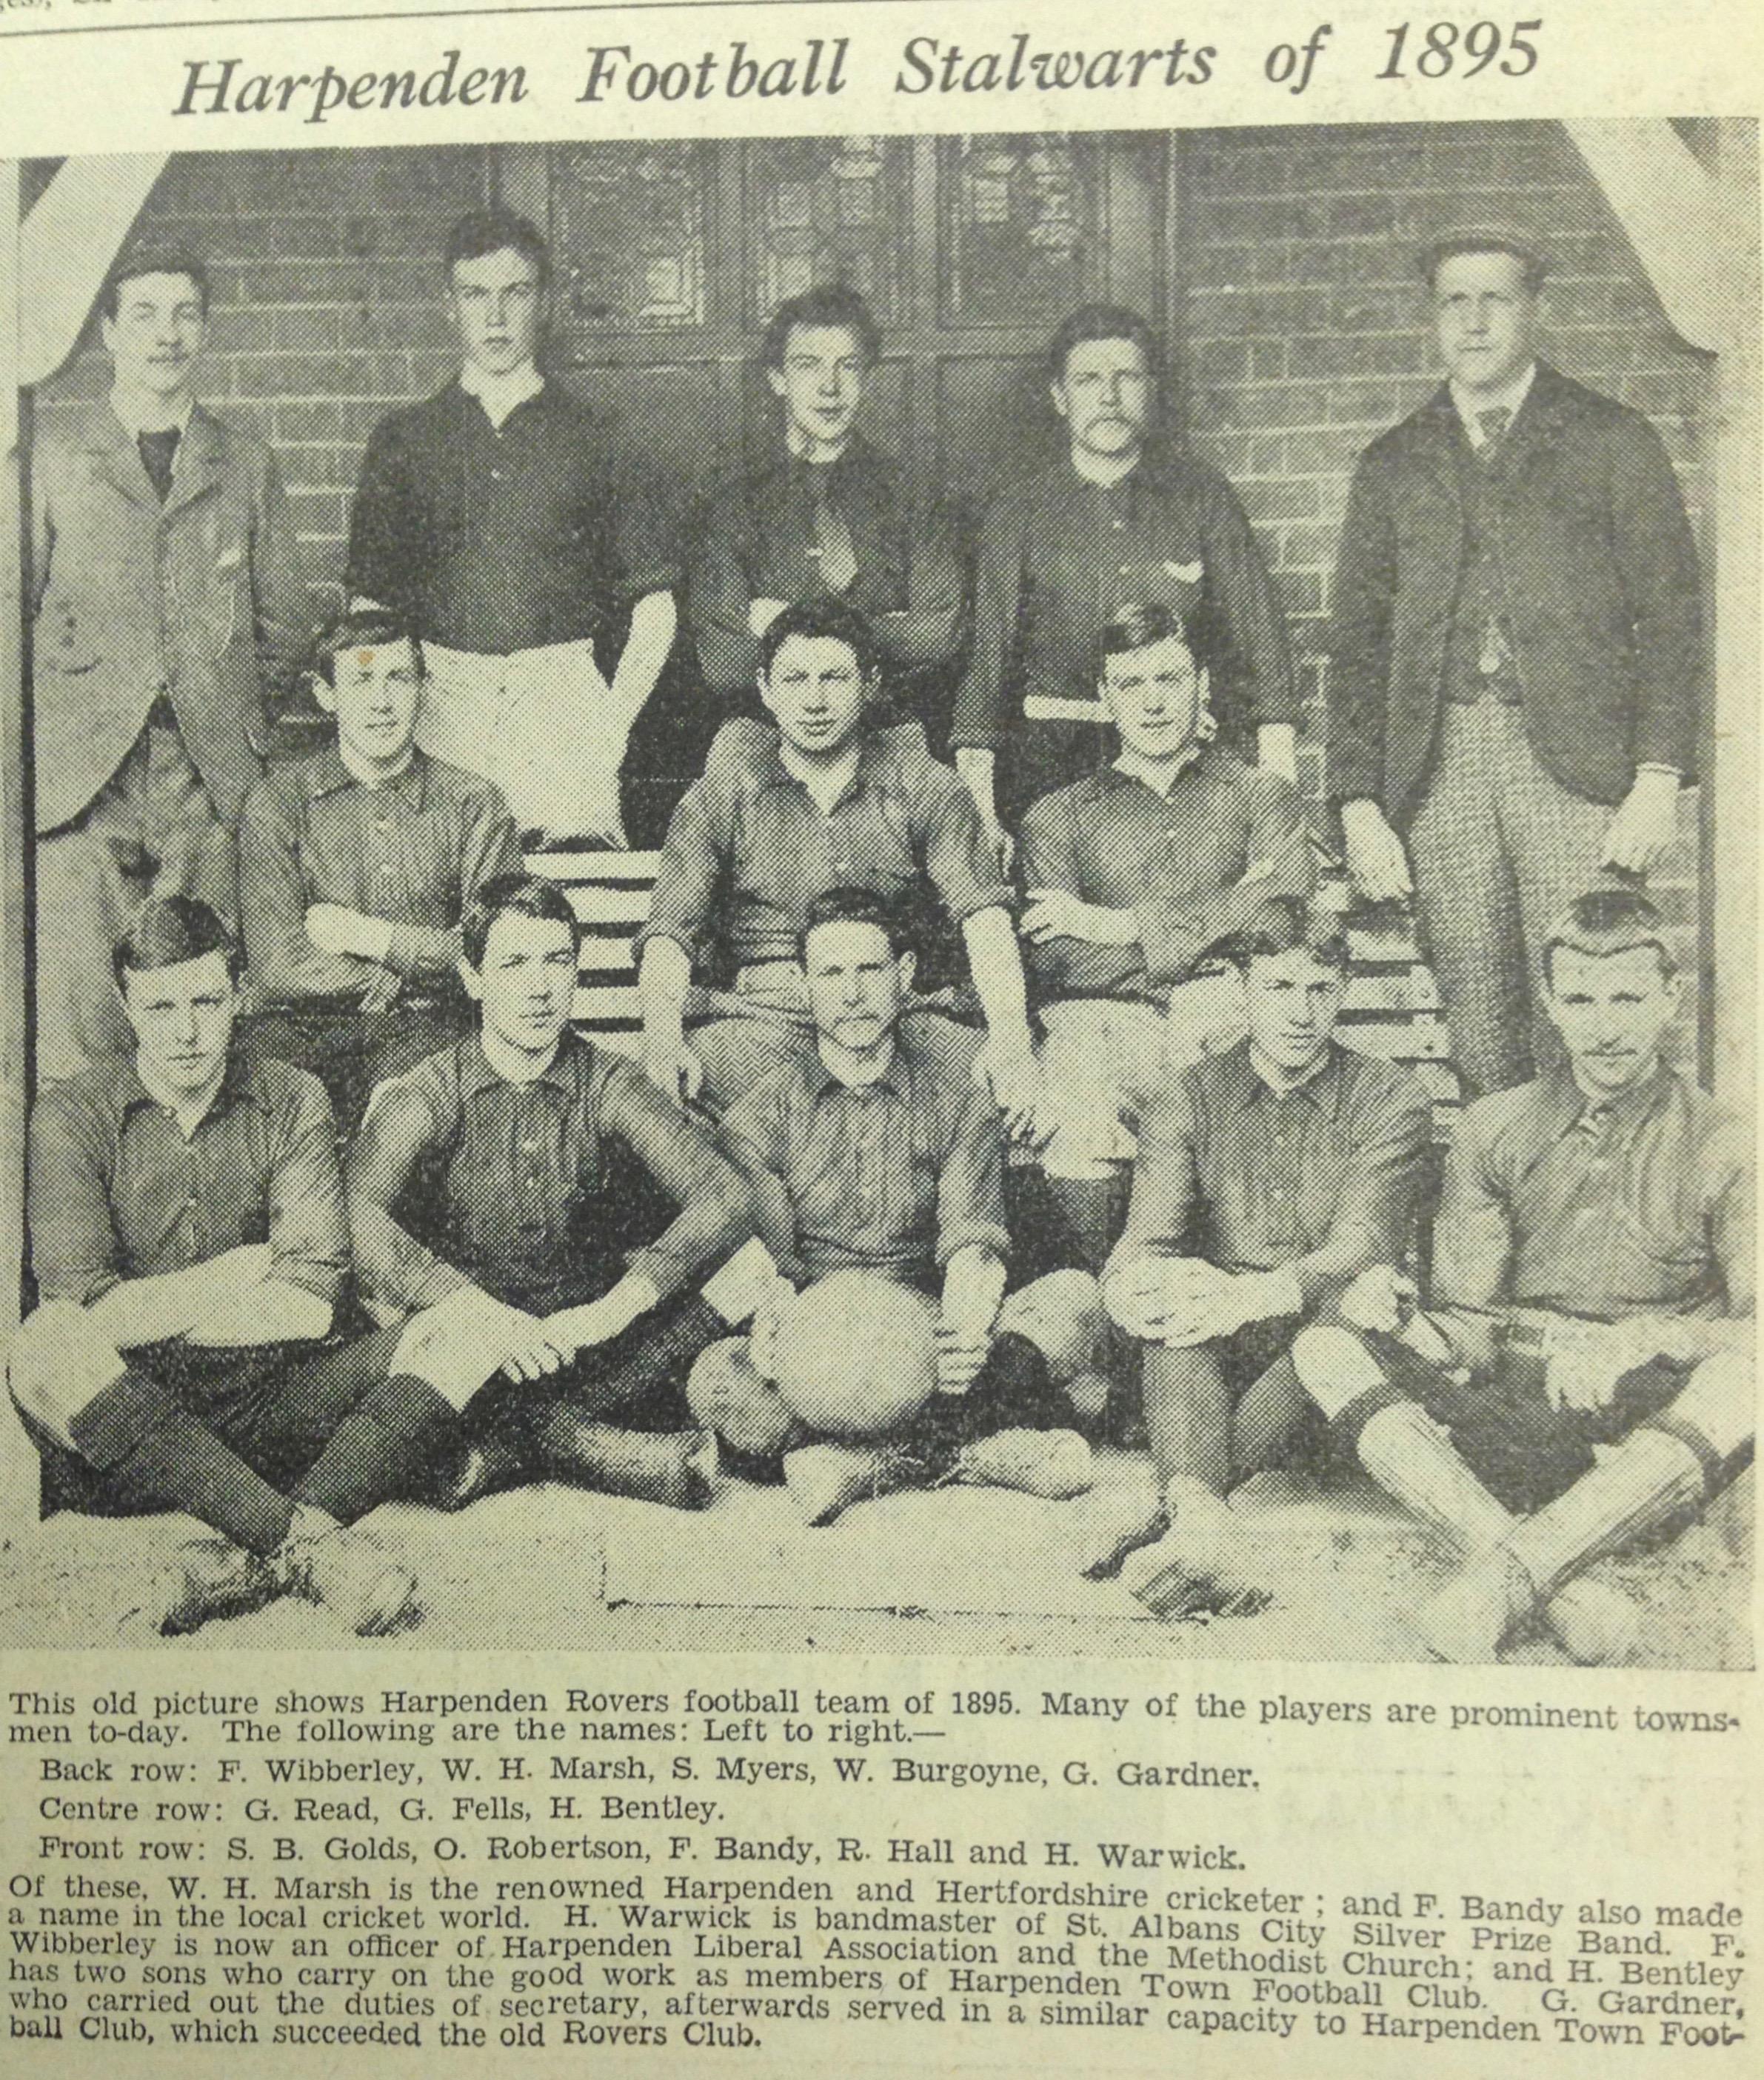 Harpenden Rovers 1895